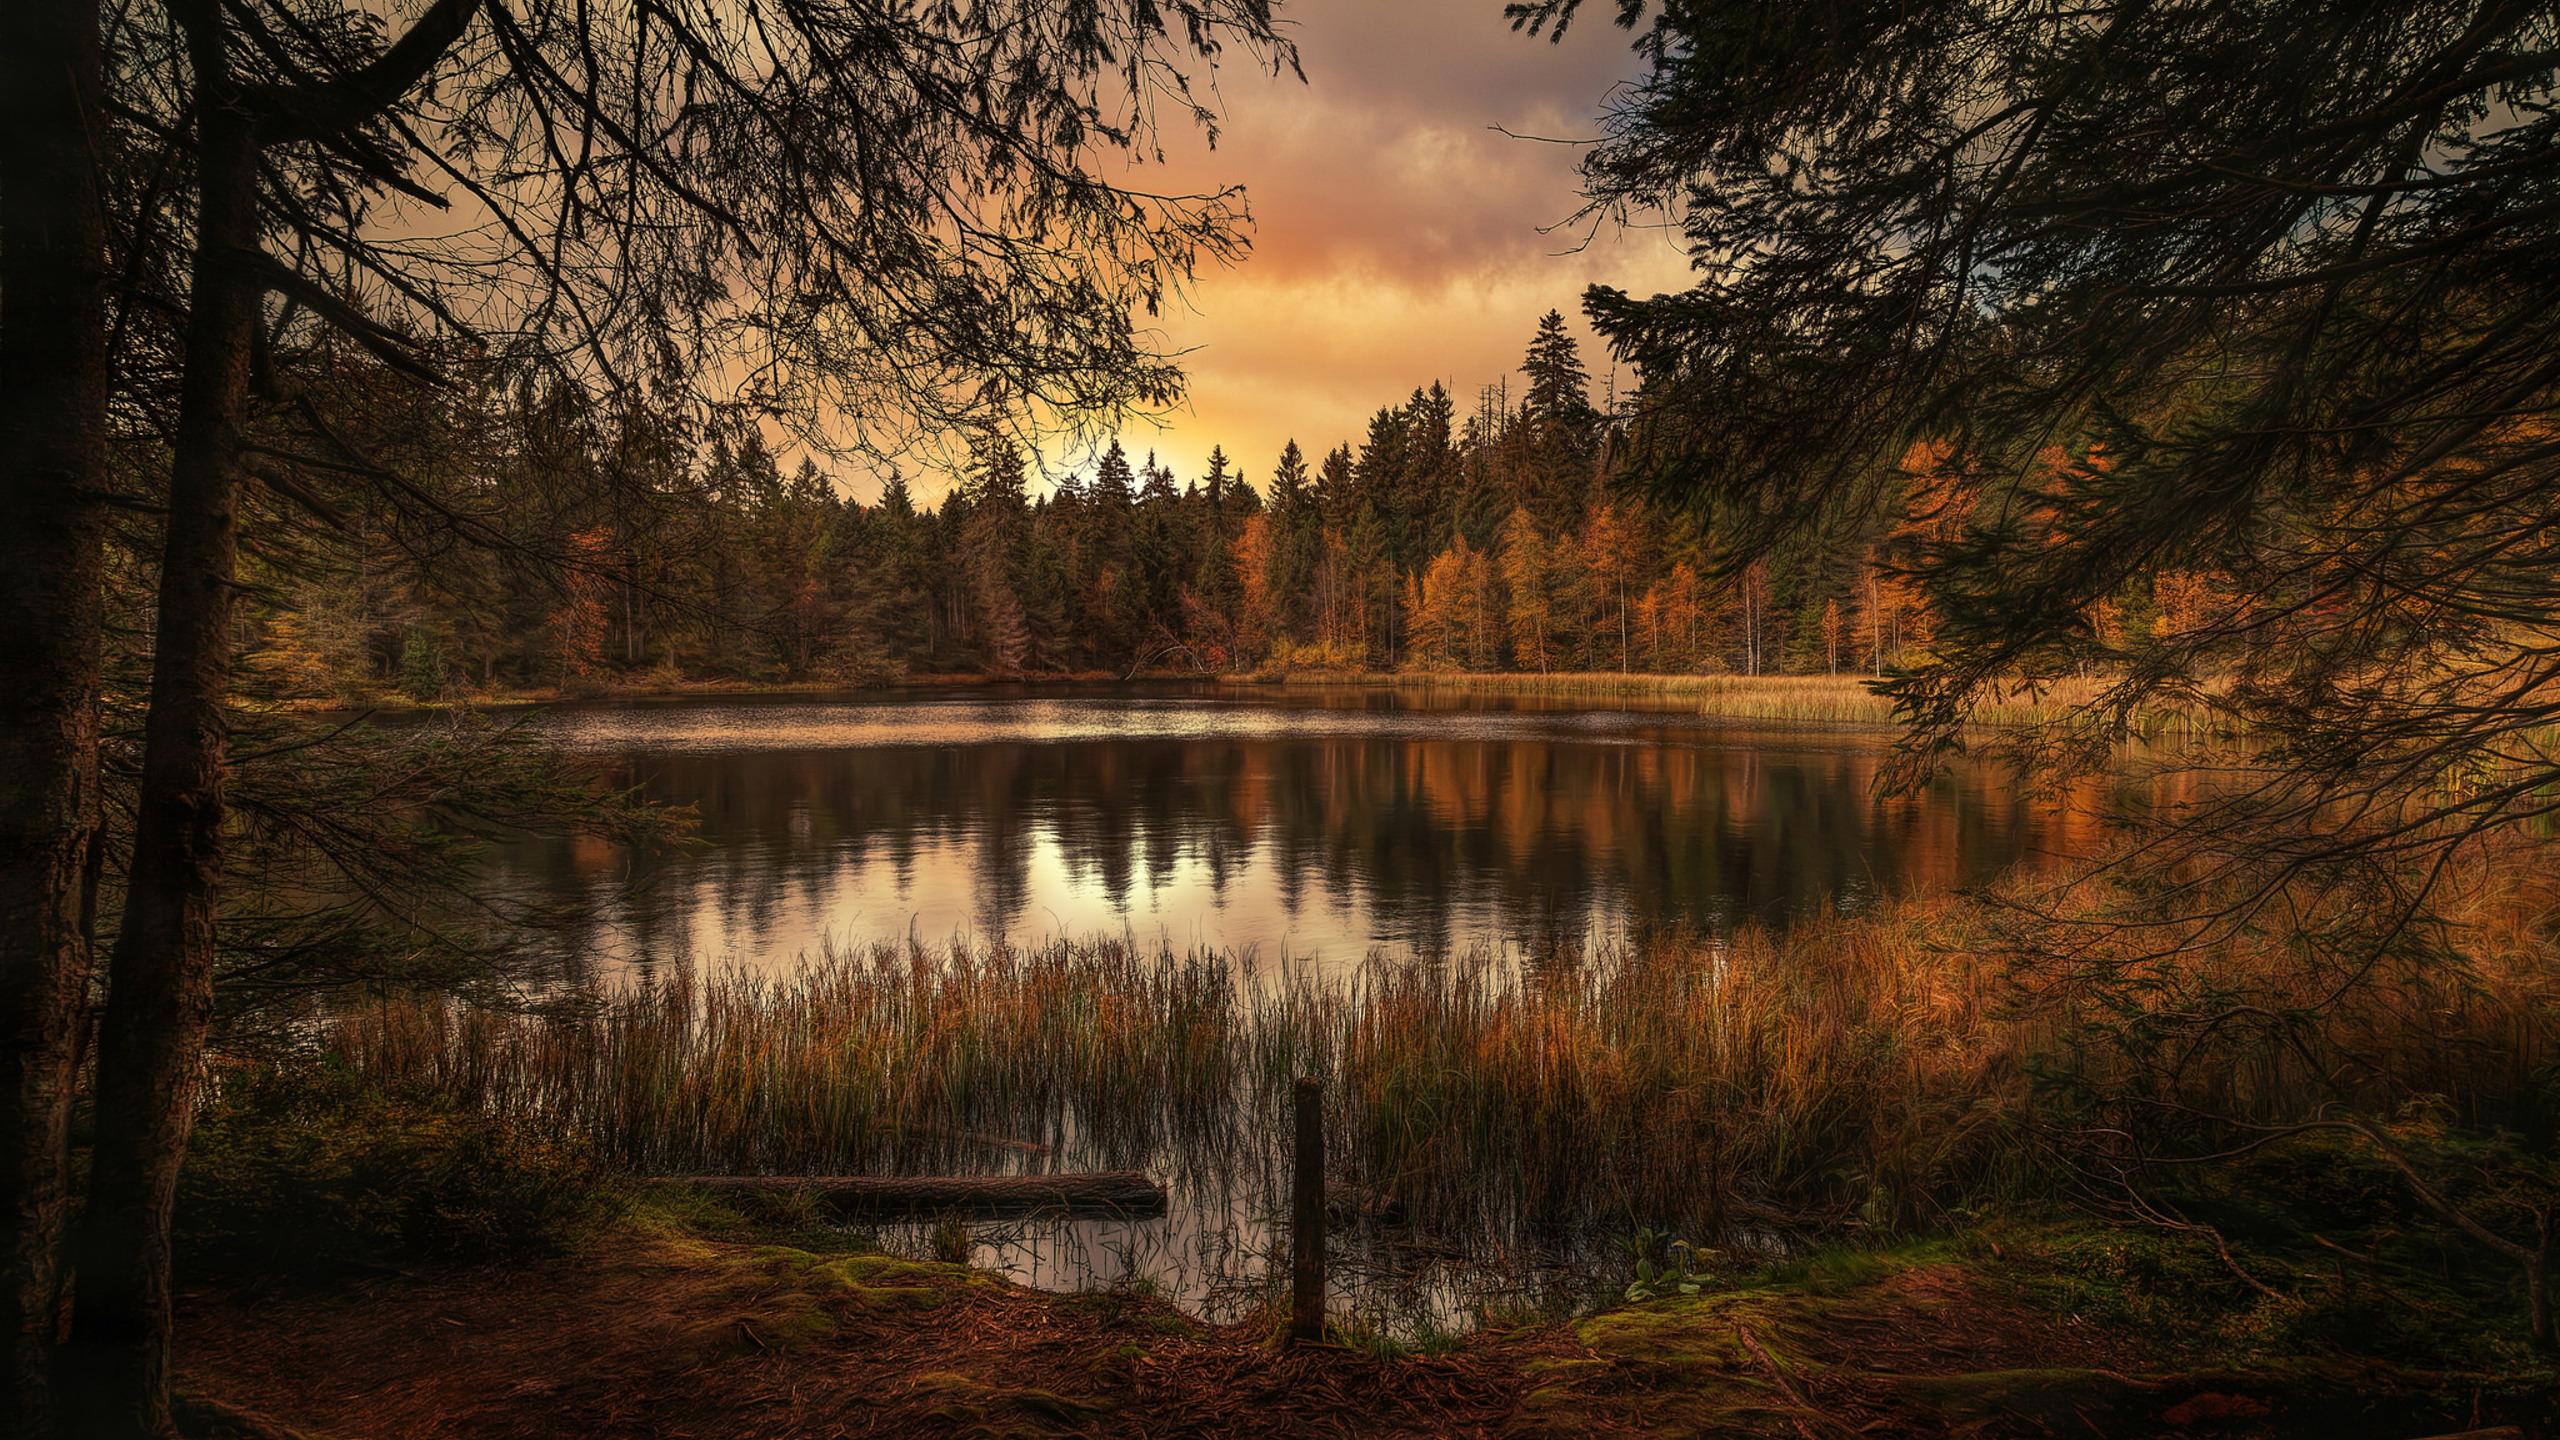 2560x1440 Forest Lake Landscape 1440P Resolution HD 4k ...